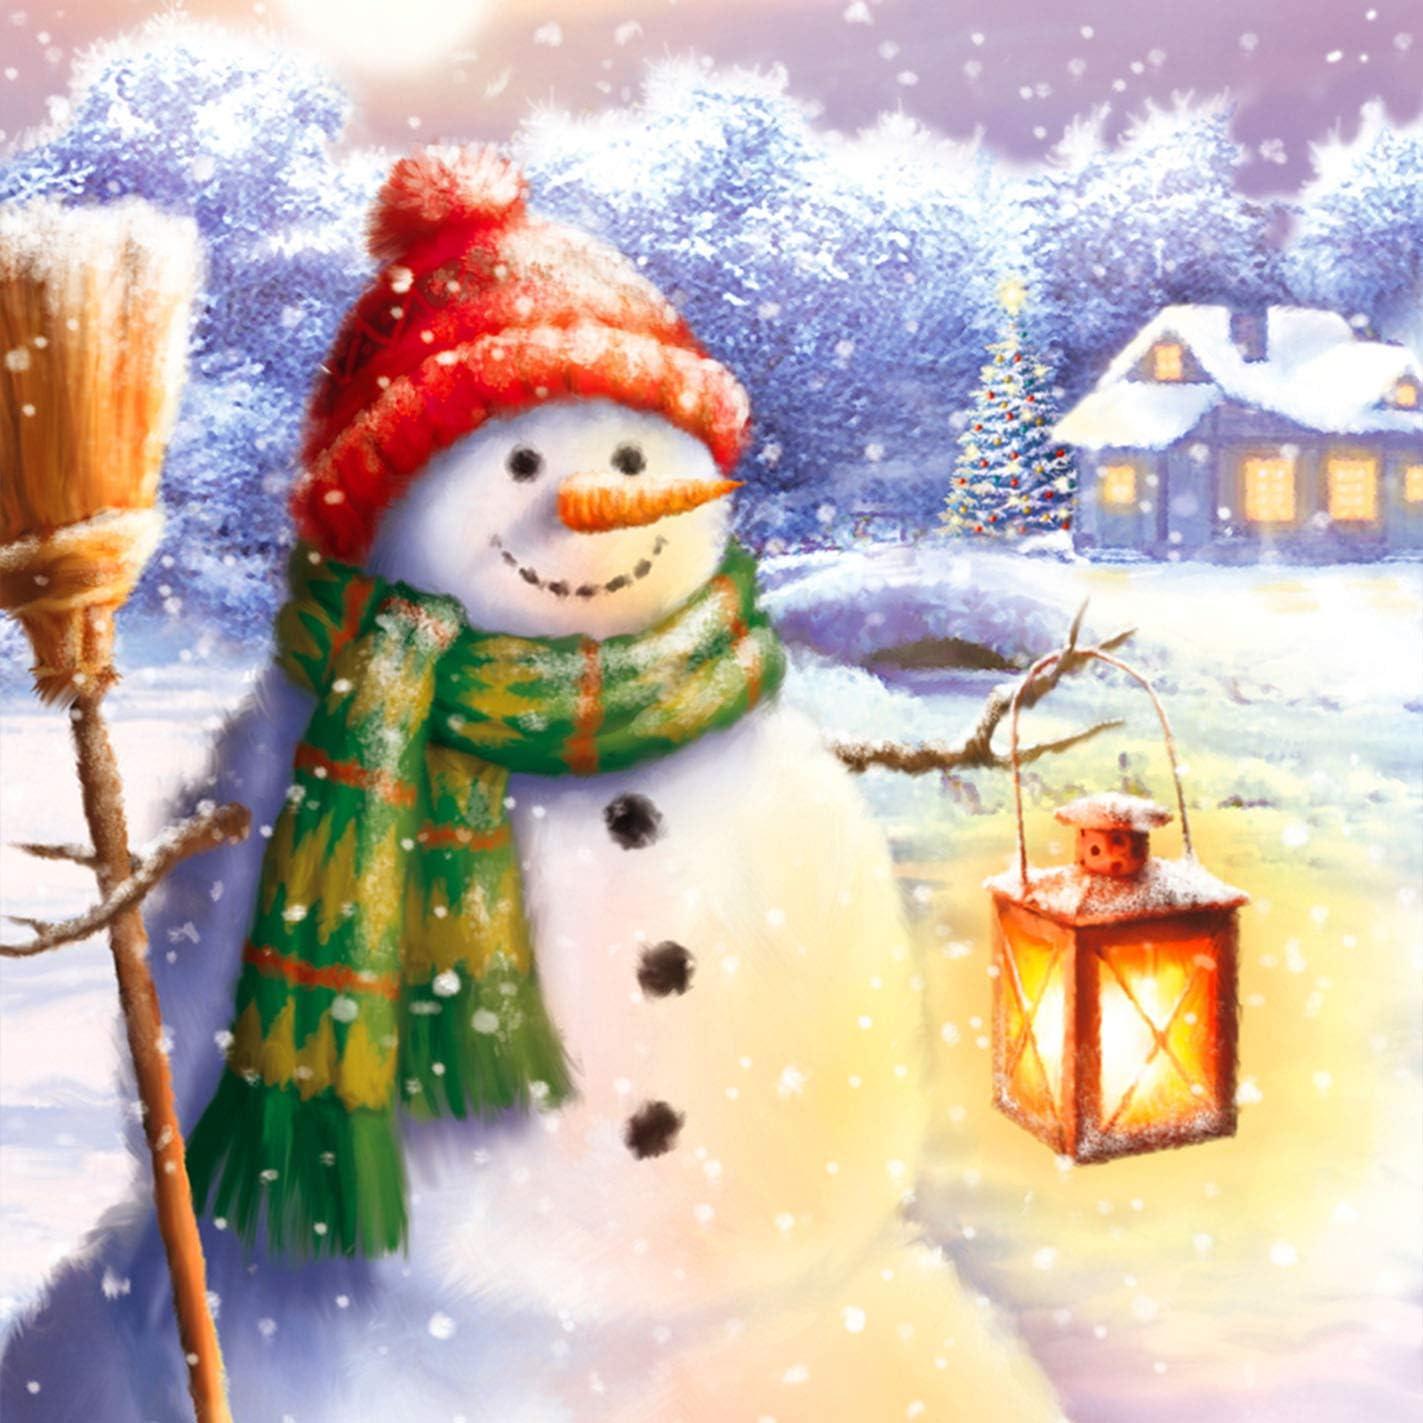 Pintura Diamante Bricolaje Completo Taladro Arte Navidad Christmas Diamantes Bordado Pegatinas de Pared Decoraci/ón de La sala 30x40cm Reofrey 5D Diamond Painting Mu/ñeco De Nieve Linterna Snowman